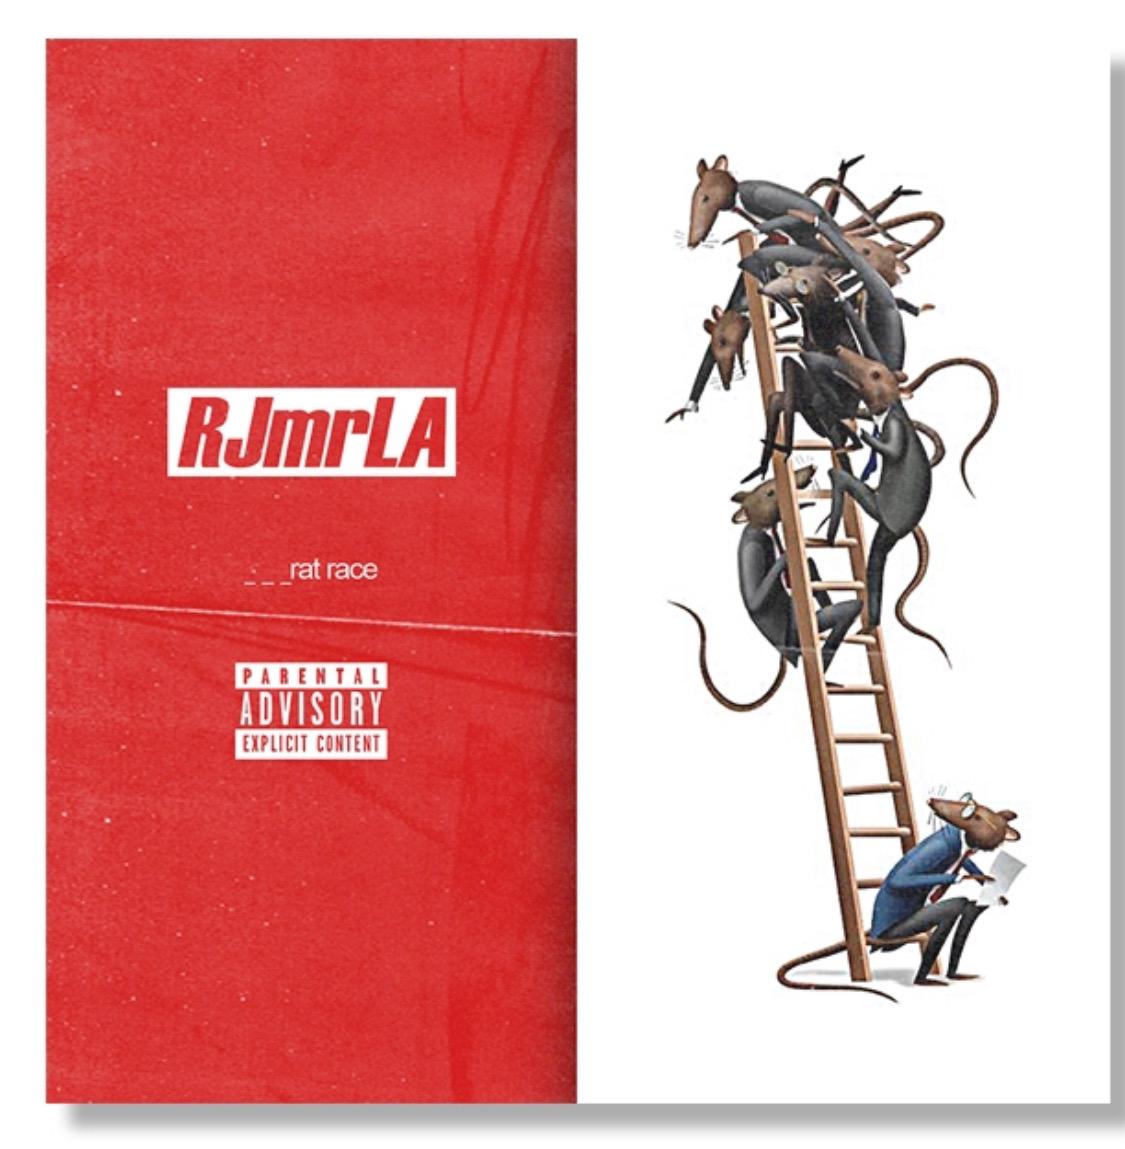 "RJMrLA Has His CashApp Goin' Brazy on the New ""Rat Race"" Single"